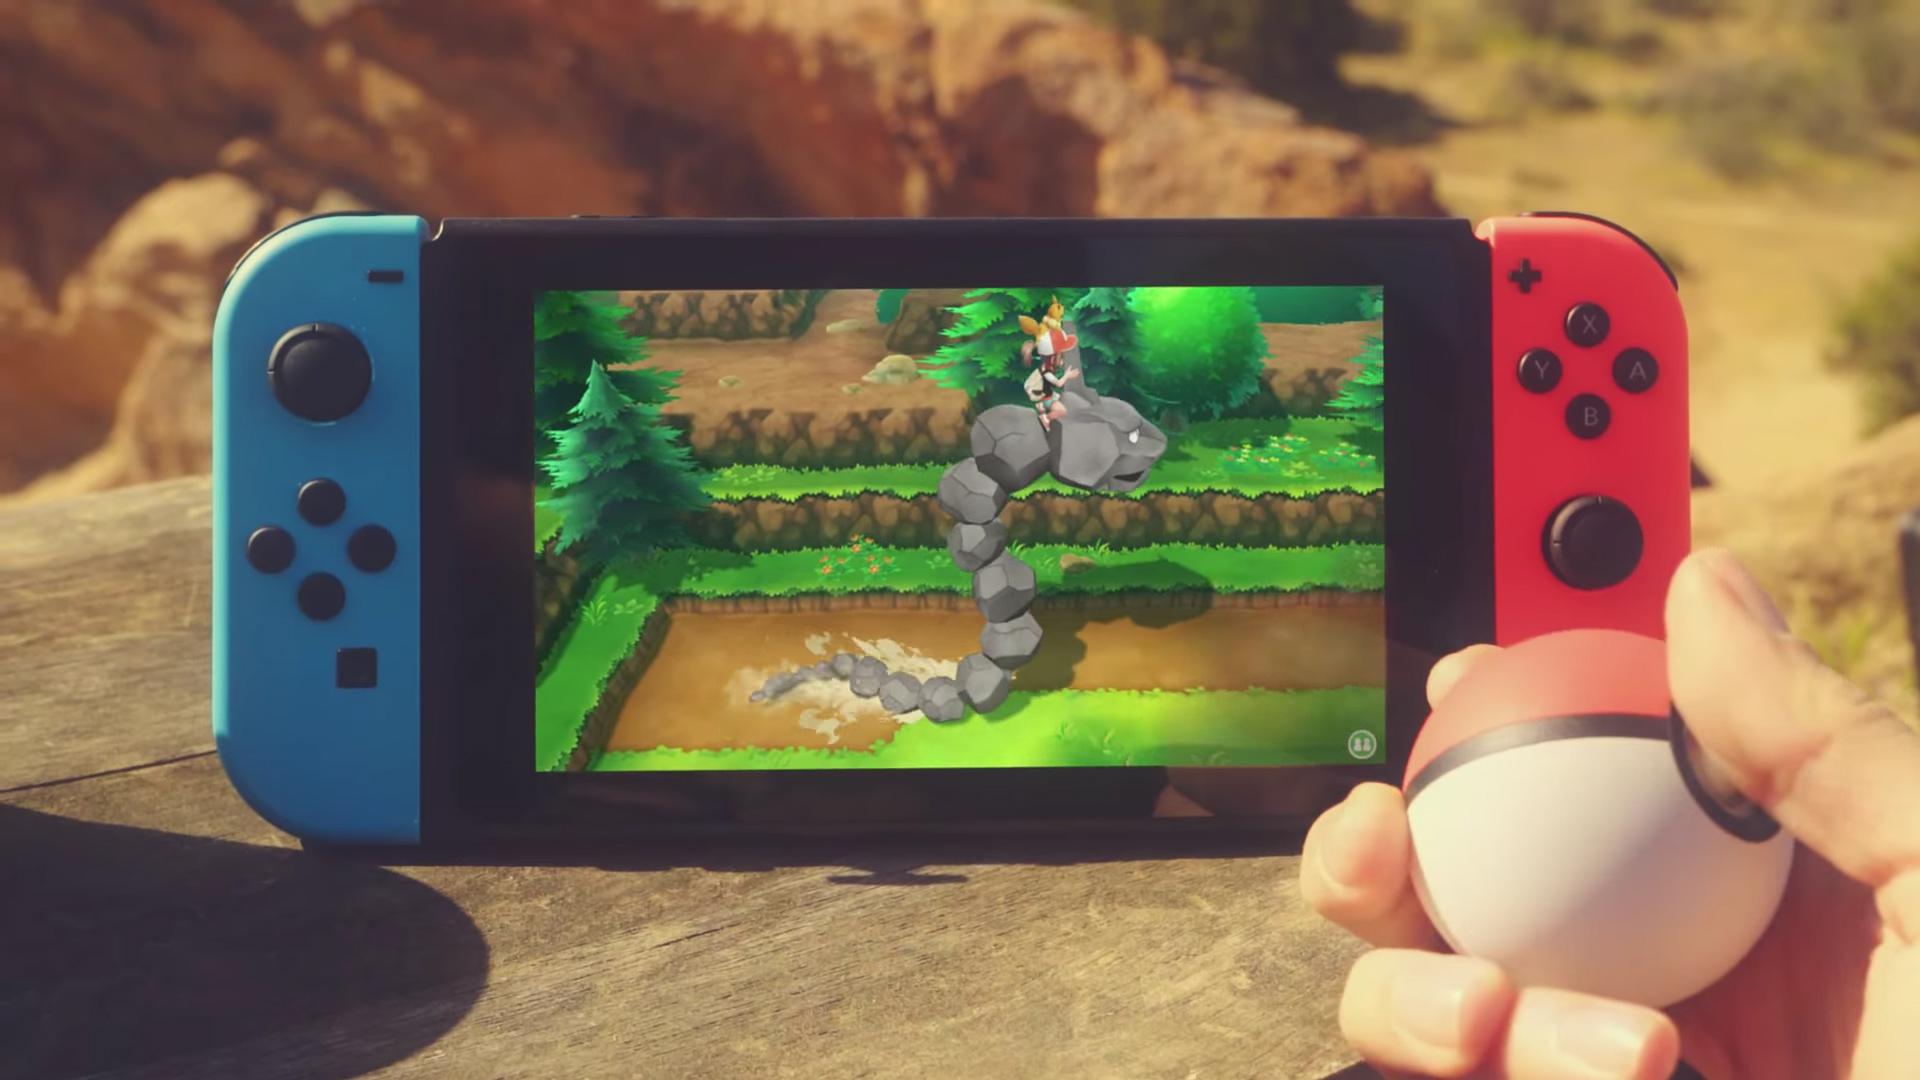 Multiple new Pokemon games revealed for Switch screenshot